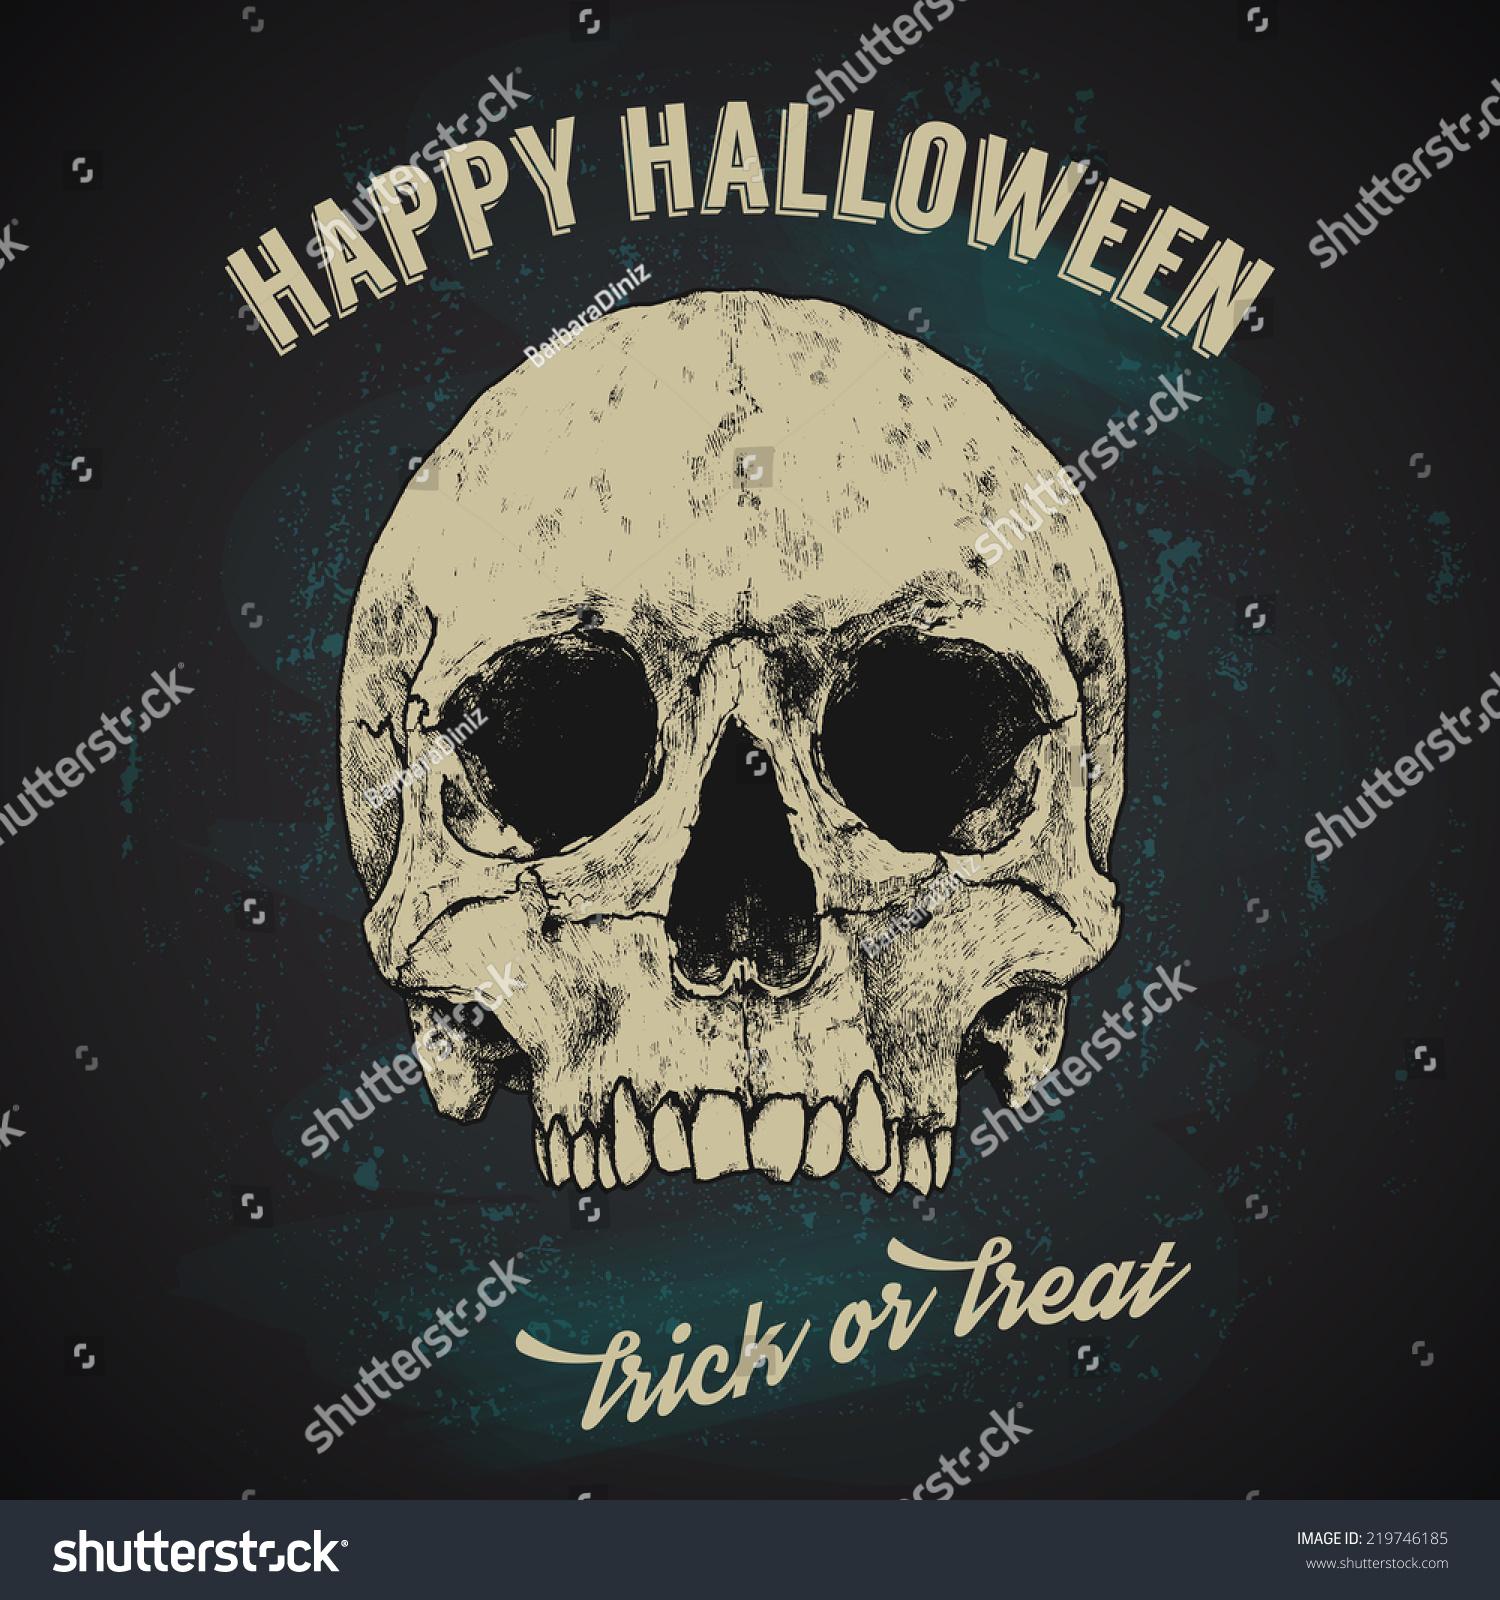 halloween greetings poster design hand drawn skull vintage